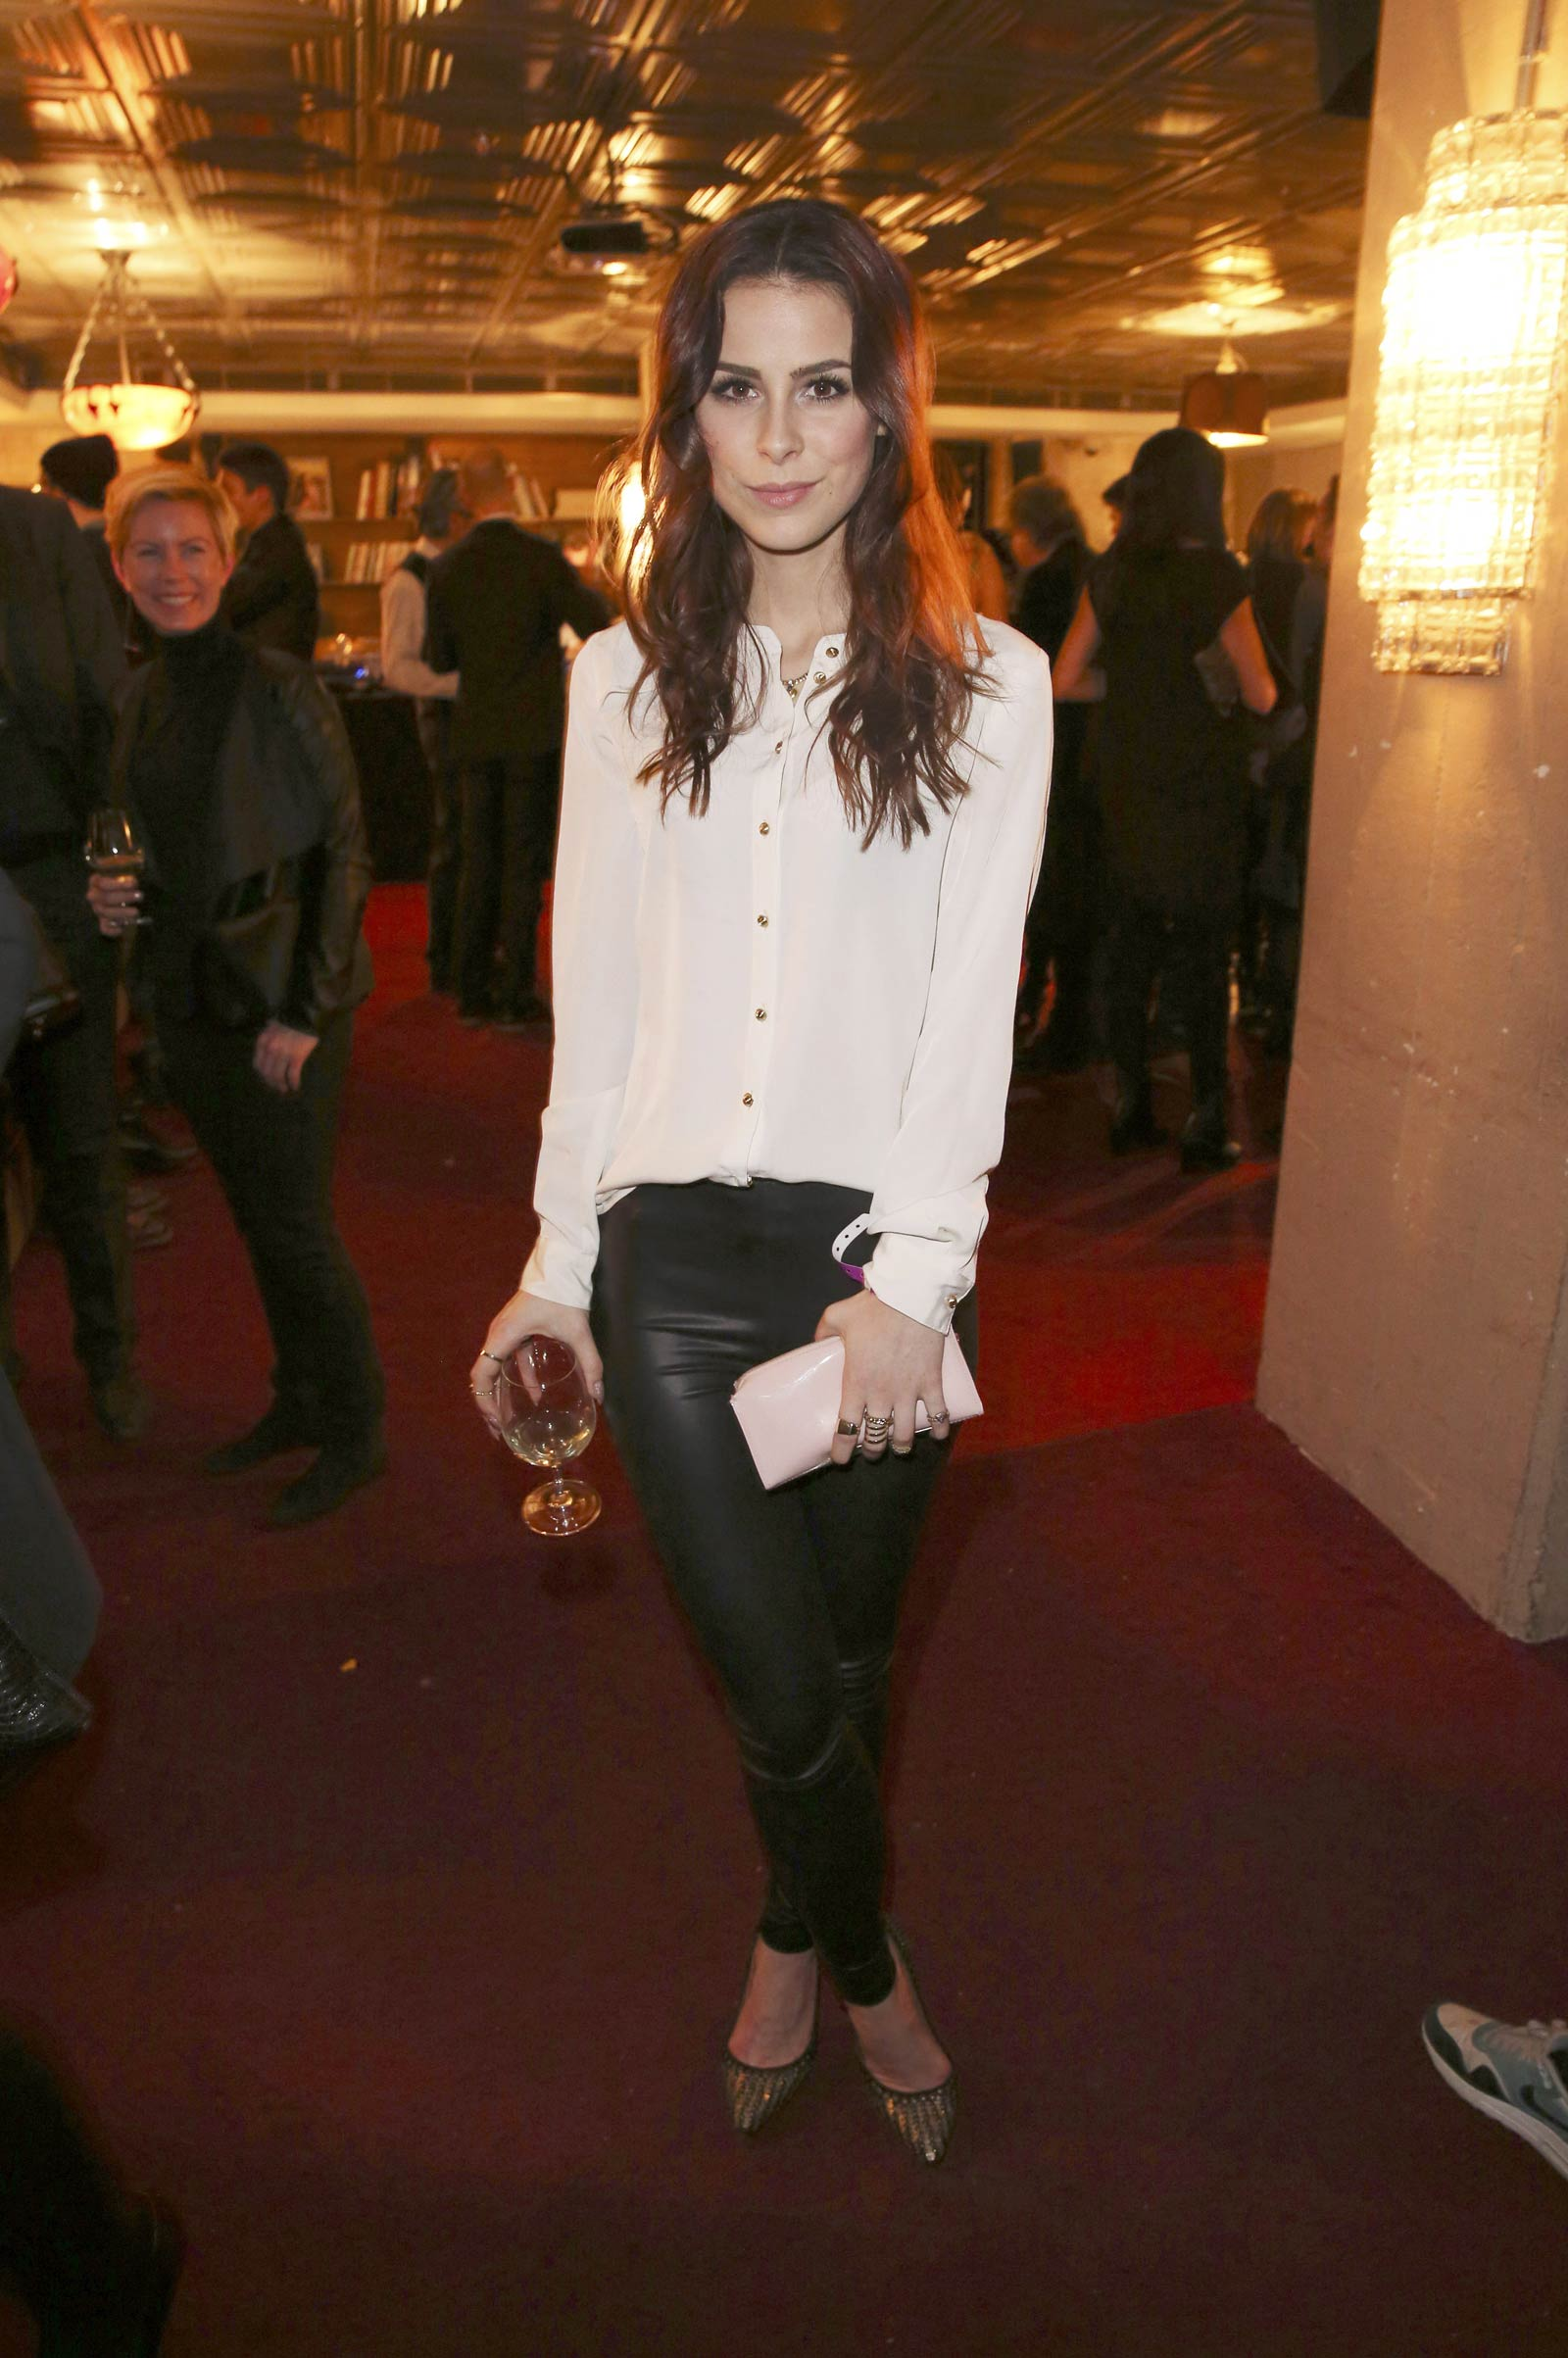 Lena Meyer Landrut Attends Mercedes Benz Fashion Week